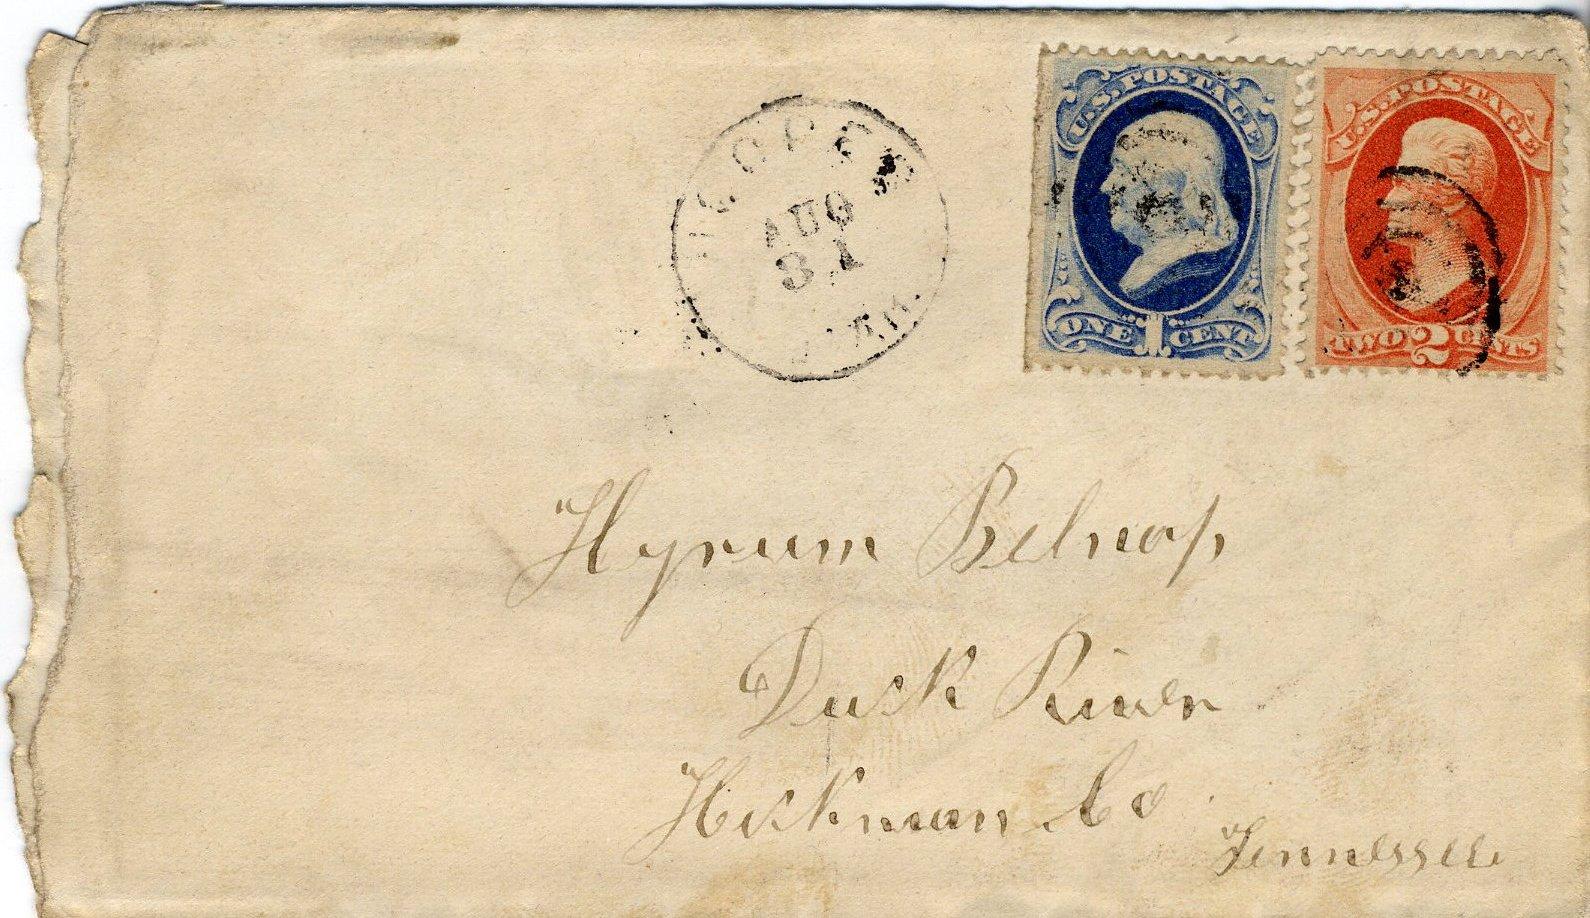 Gilbert_Belnap_Letter_(1881-08-31)_p3.jpg